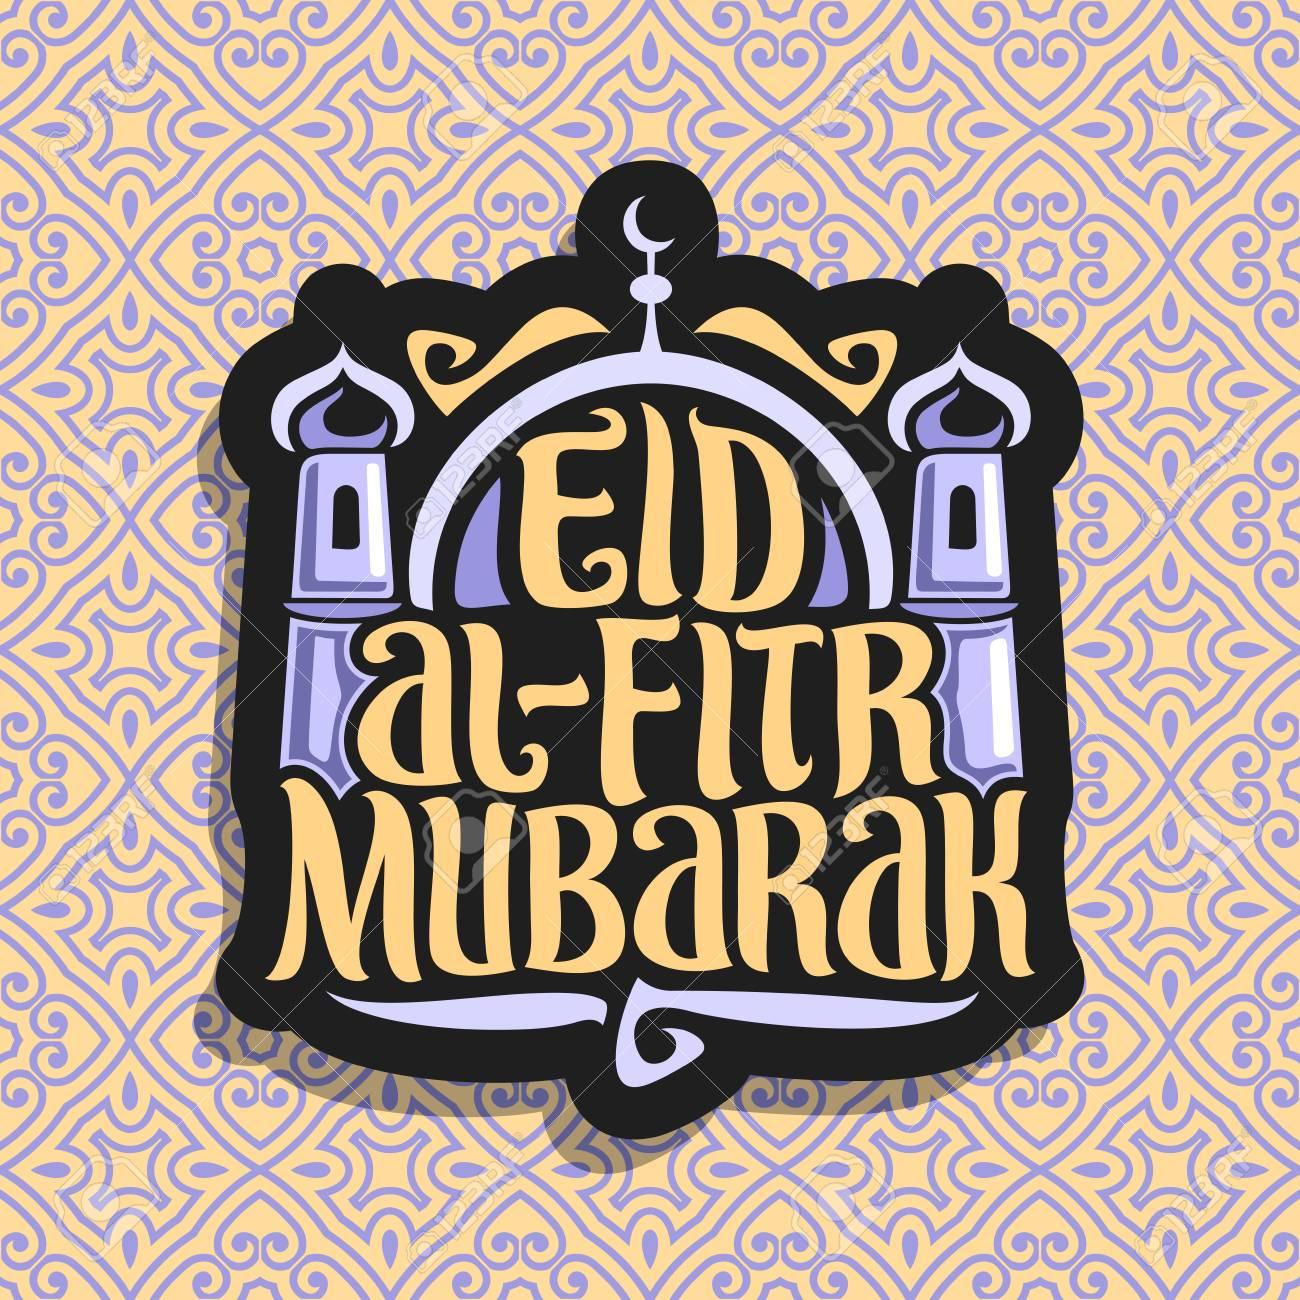 Great Morocco Eid Al-Fitr 2018 - 98550587-muslim-greeting-calligraphy-eid-al-fitr-mubarak-poster-with-original-brush-typeface-for-words-eid-al  Pic_375100 .jpg